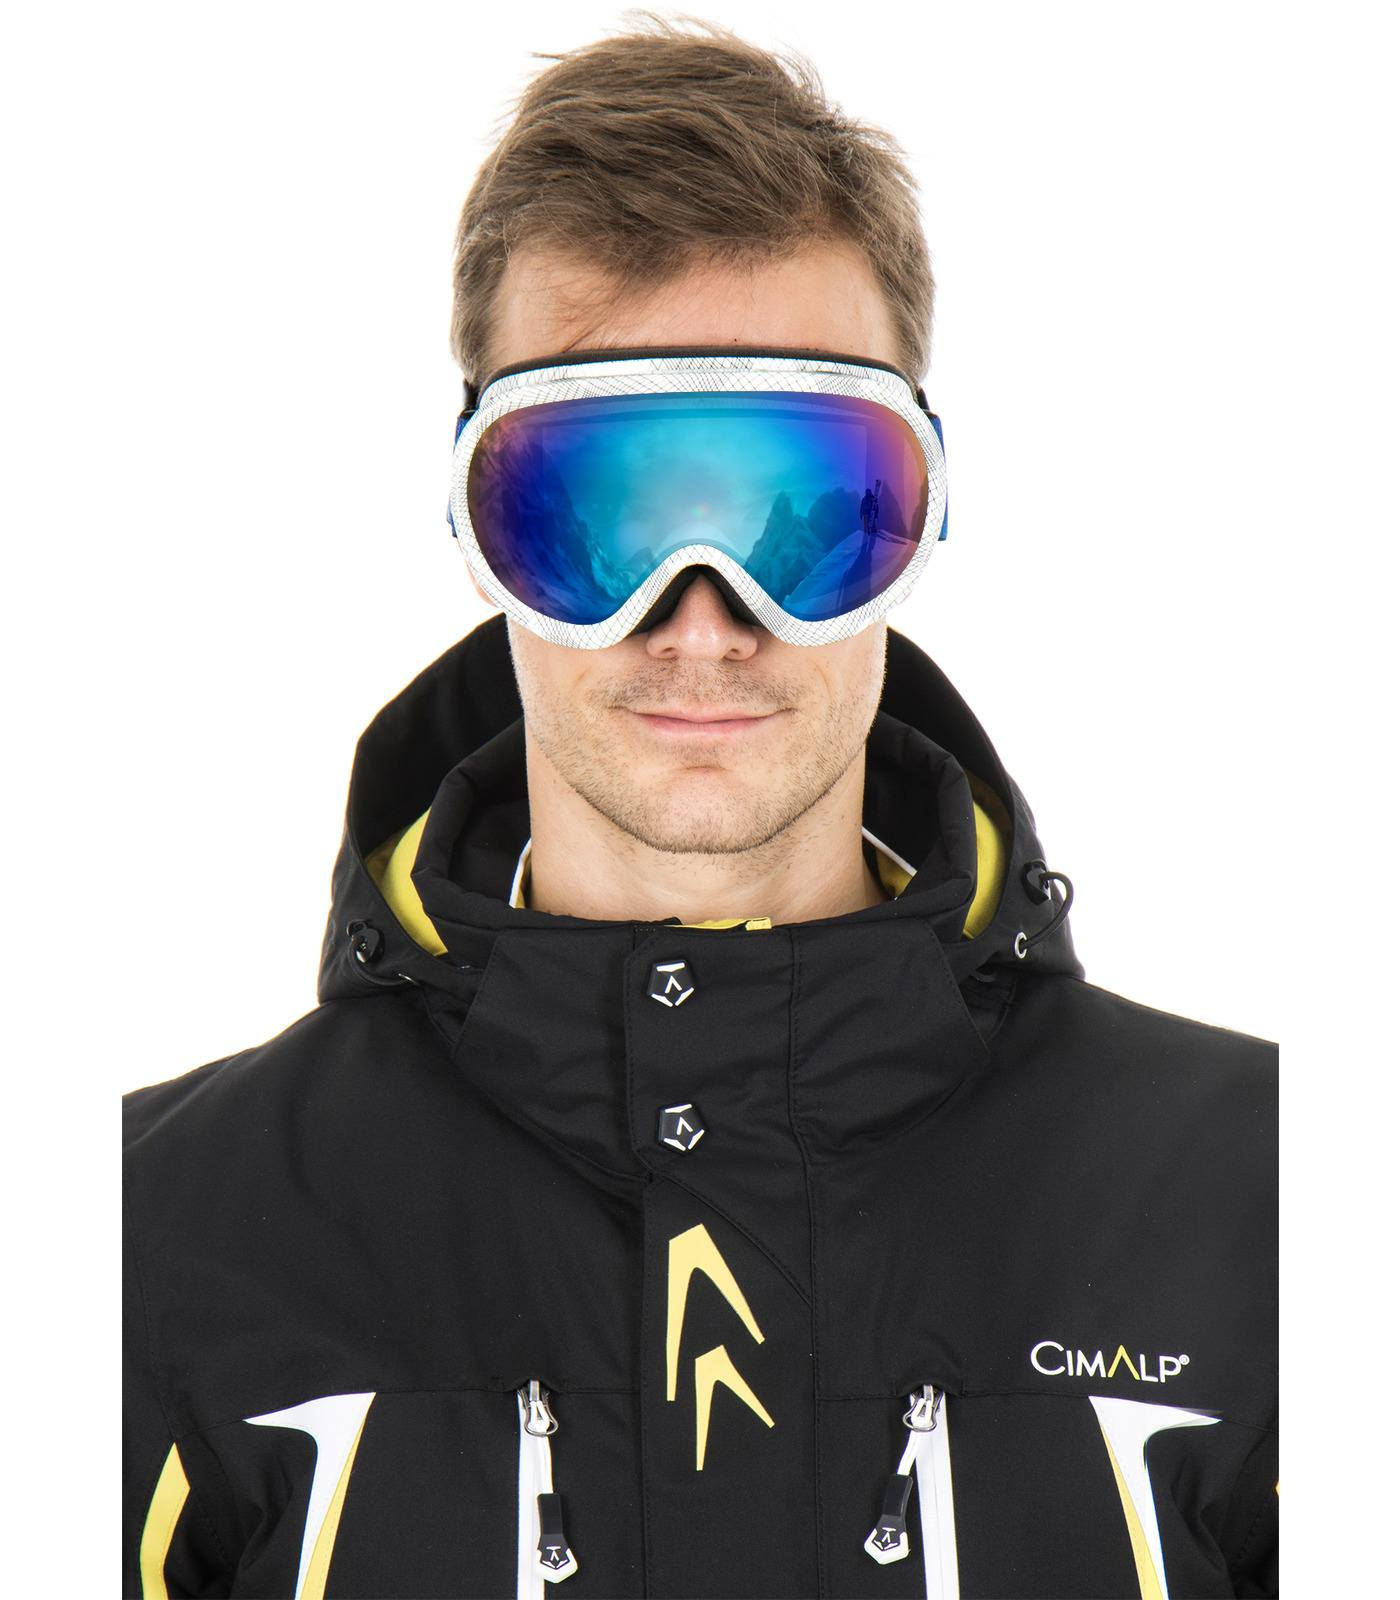 masque de ski double écran